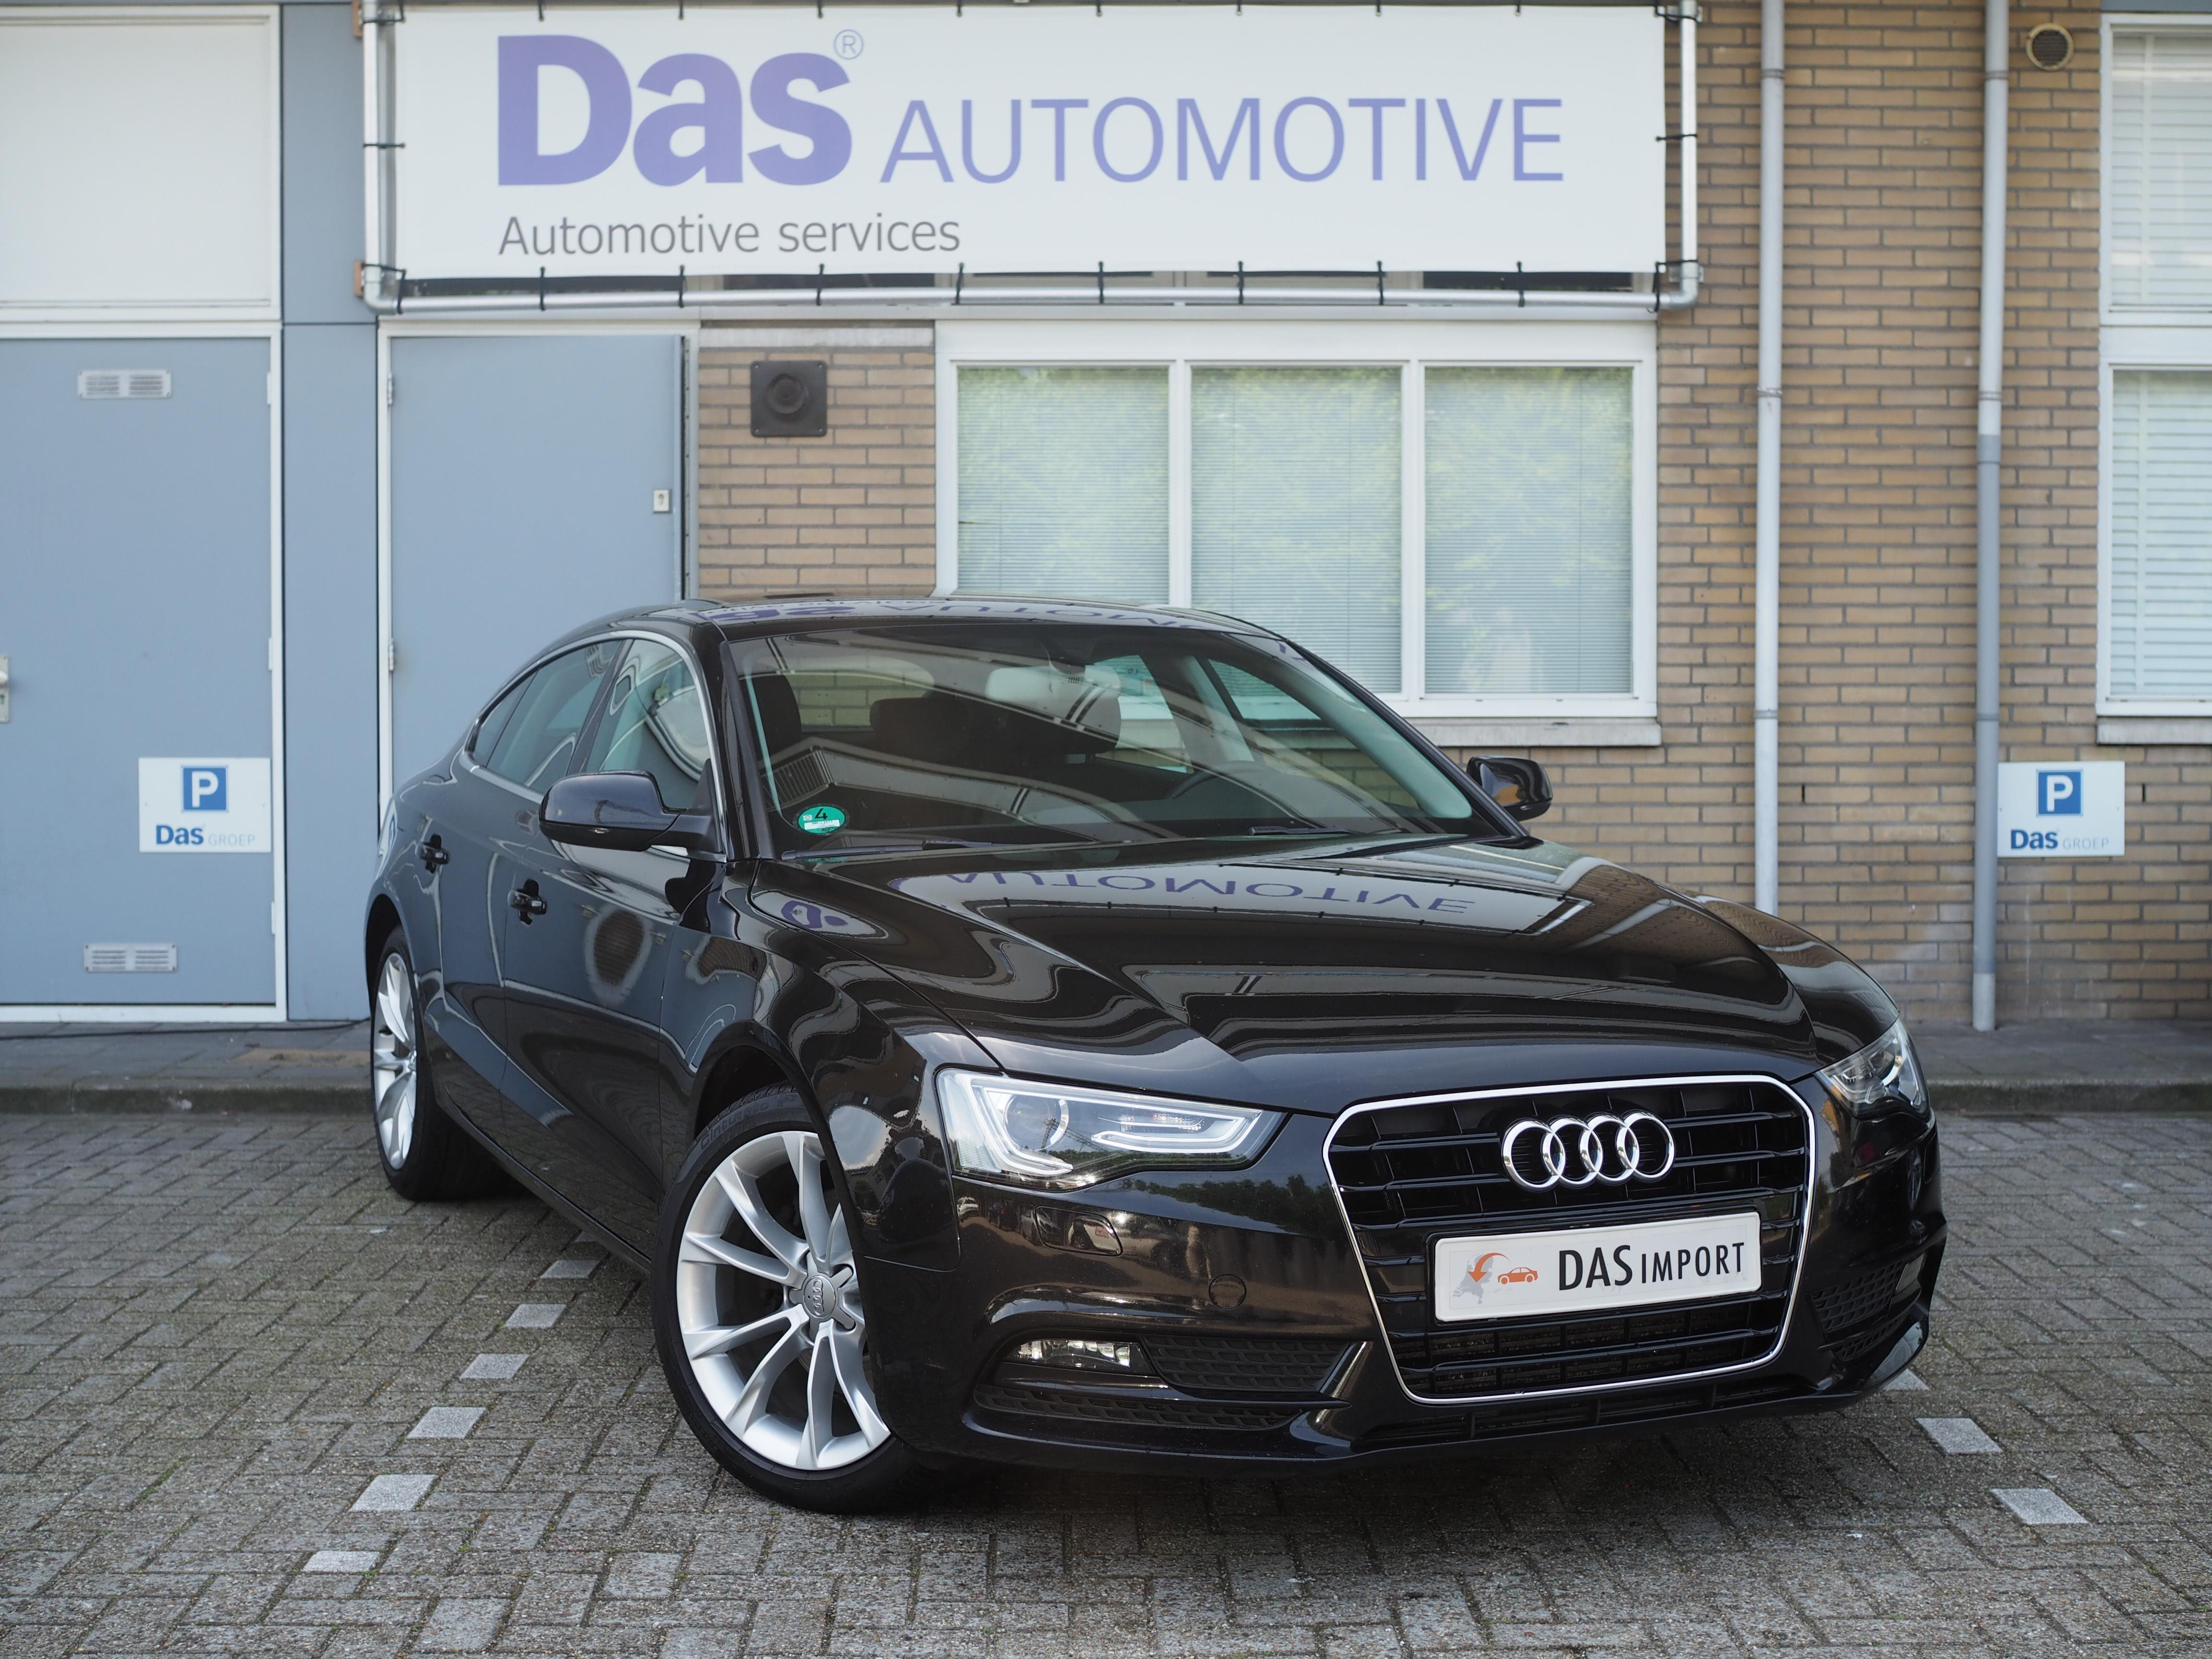 Importauto: Audi A5 Sportback 1.8 TFSI 125kW multitronic 2/2013